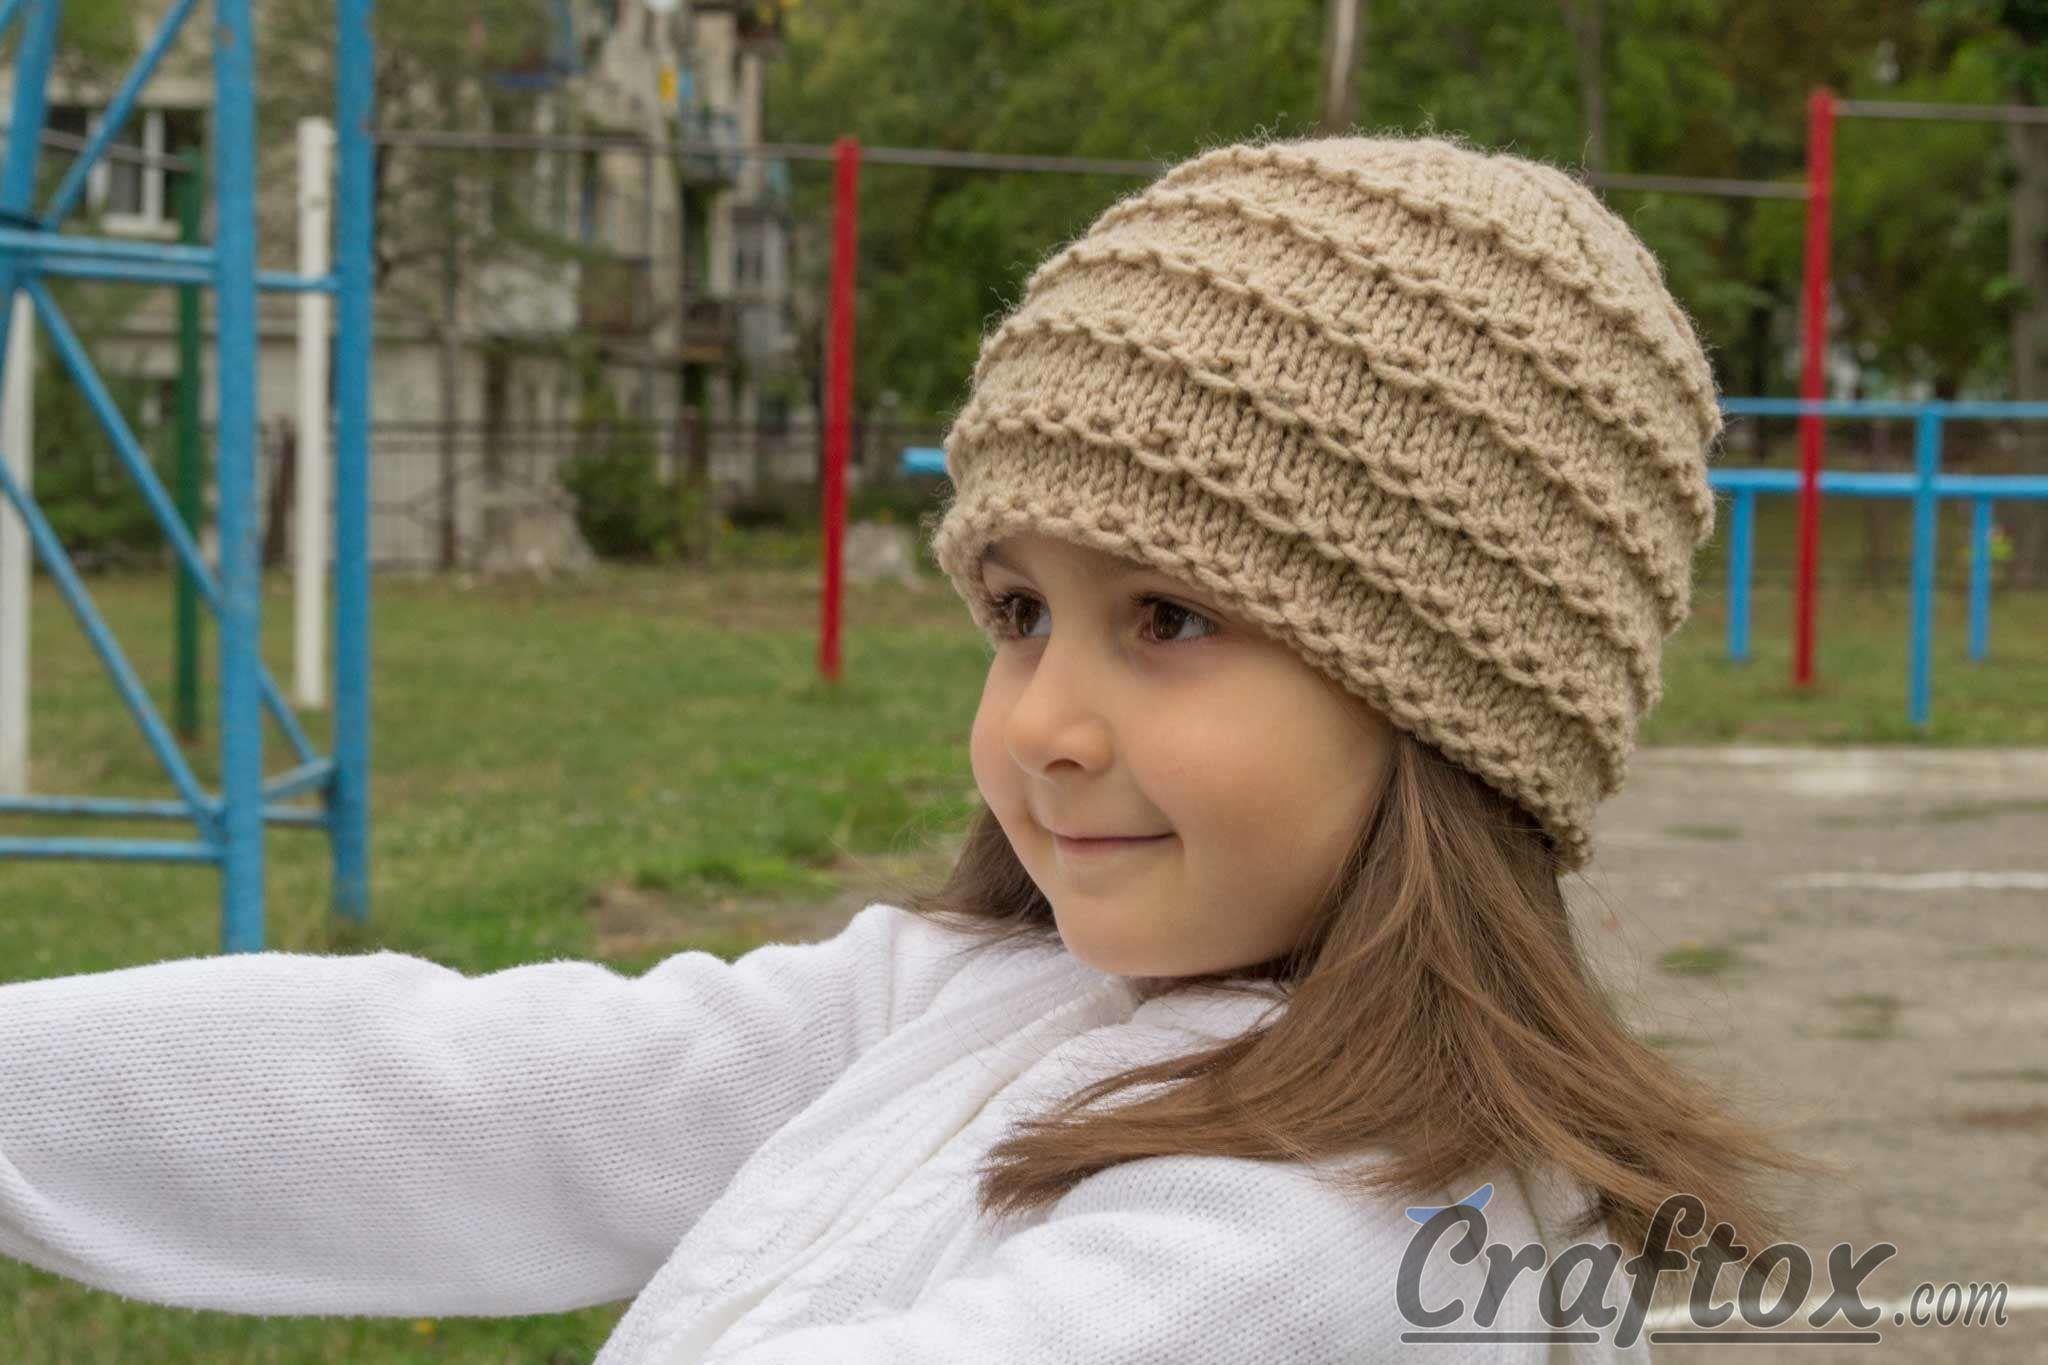 Free Knitting Pattern Beanie Easy : Easy beanie knitting pattern. Free.